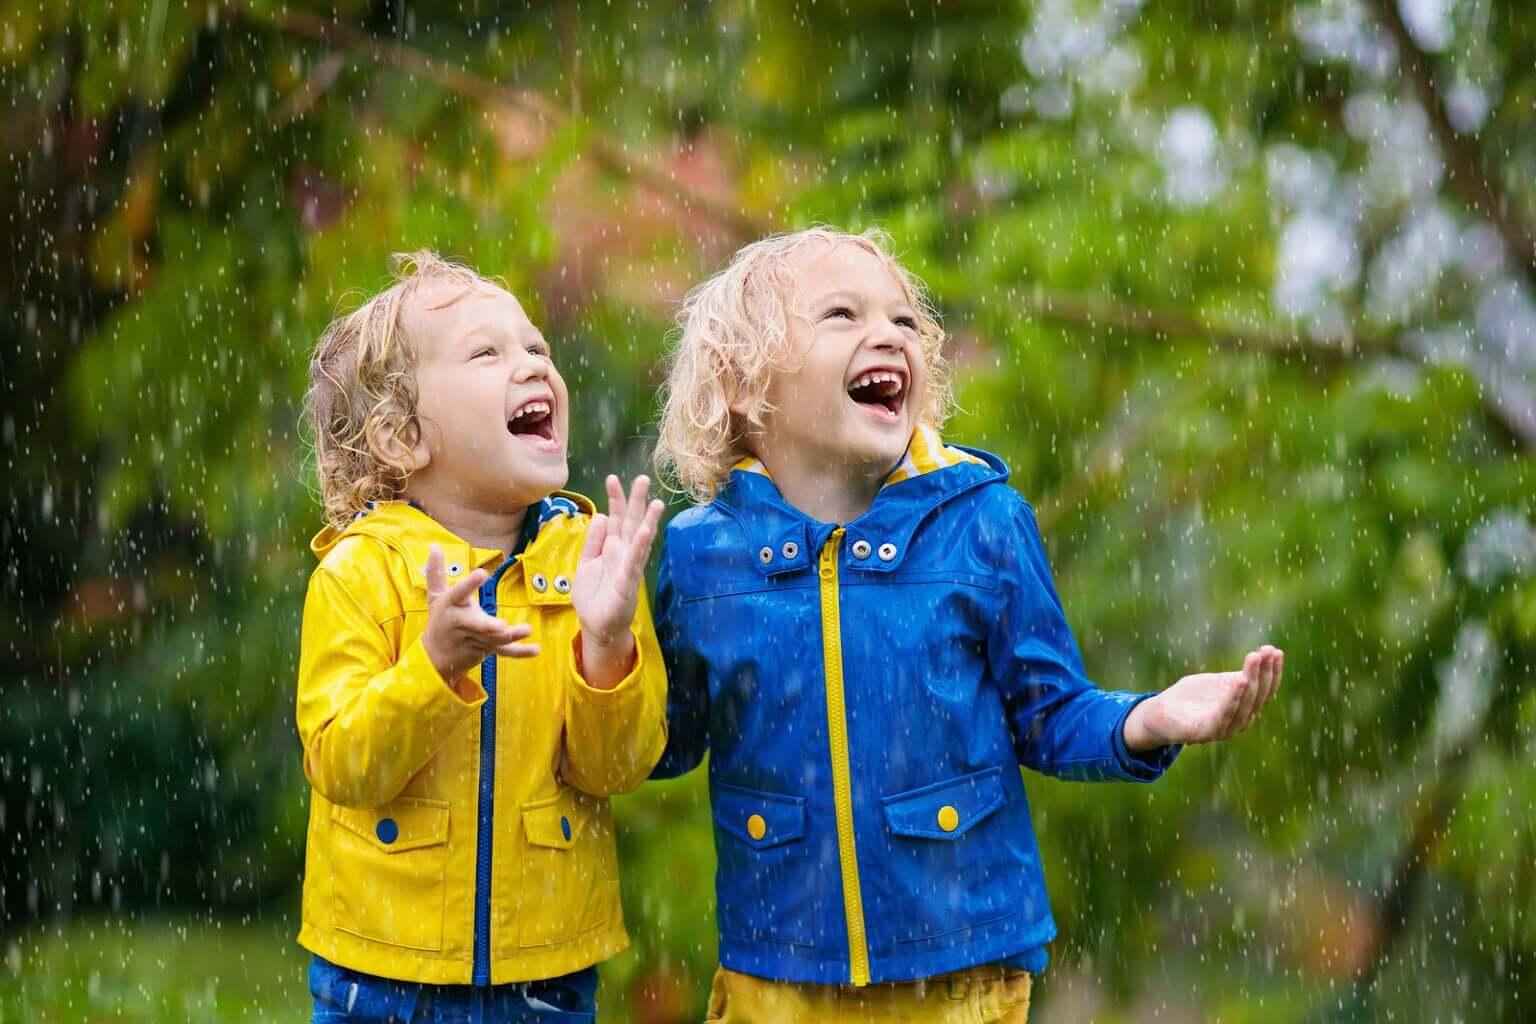 Primos bajo la lluvia.